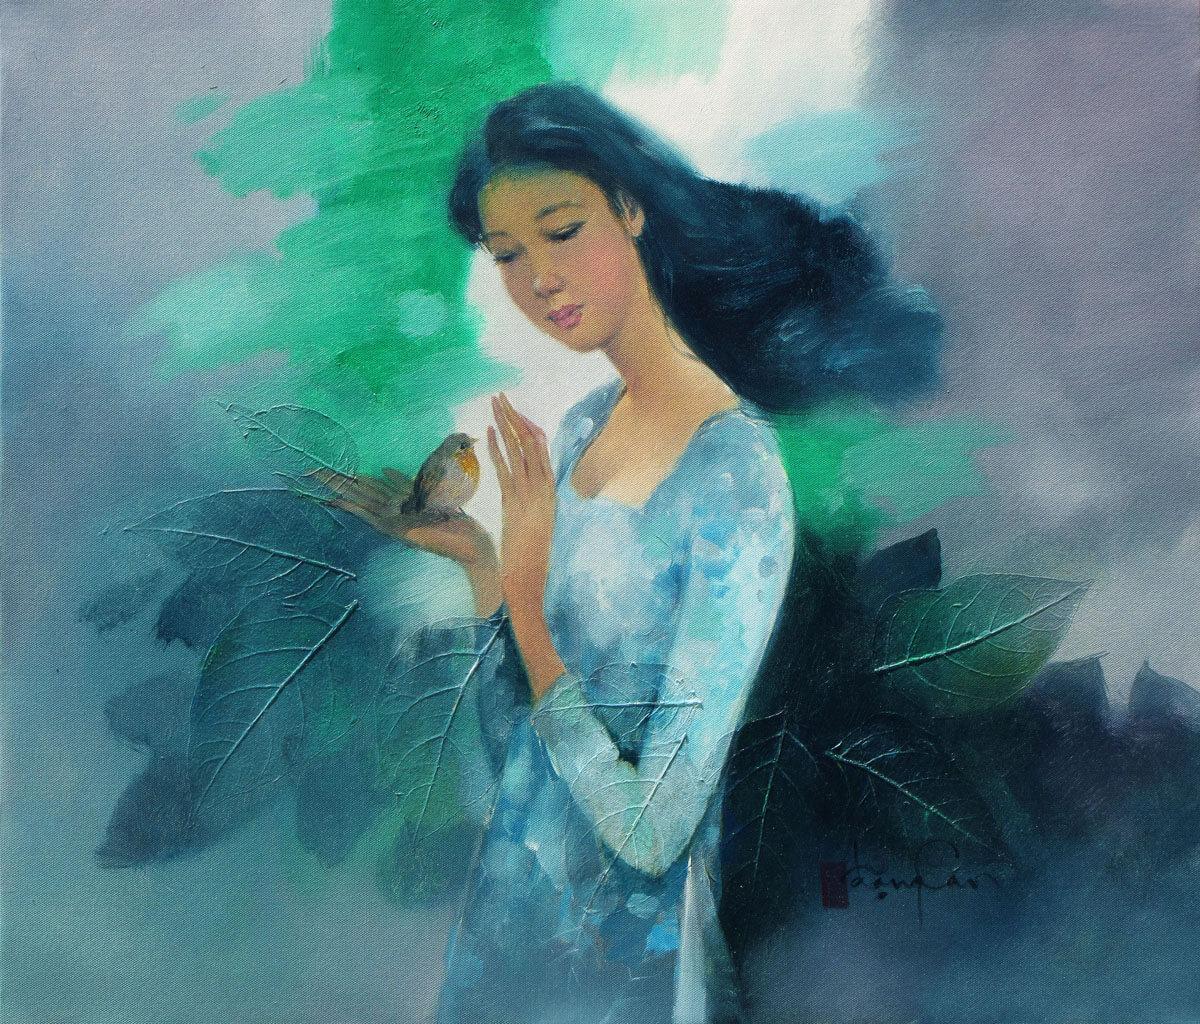 Young lady and the bird-Original Vietnamese Art